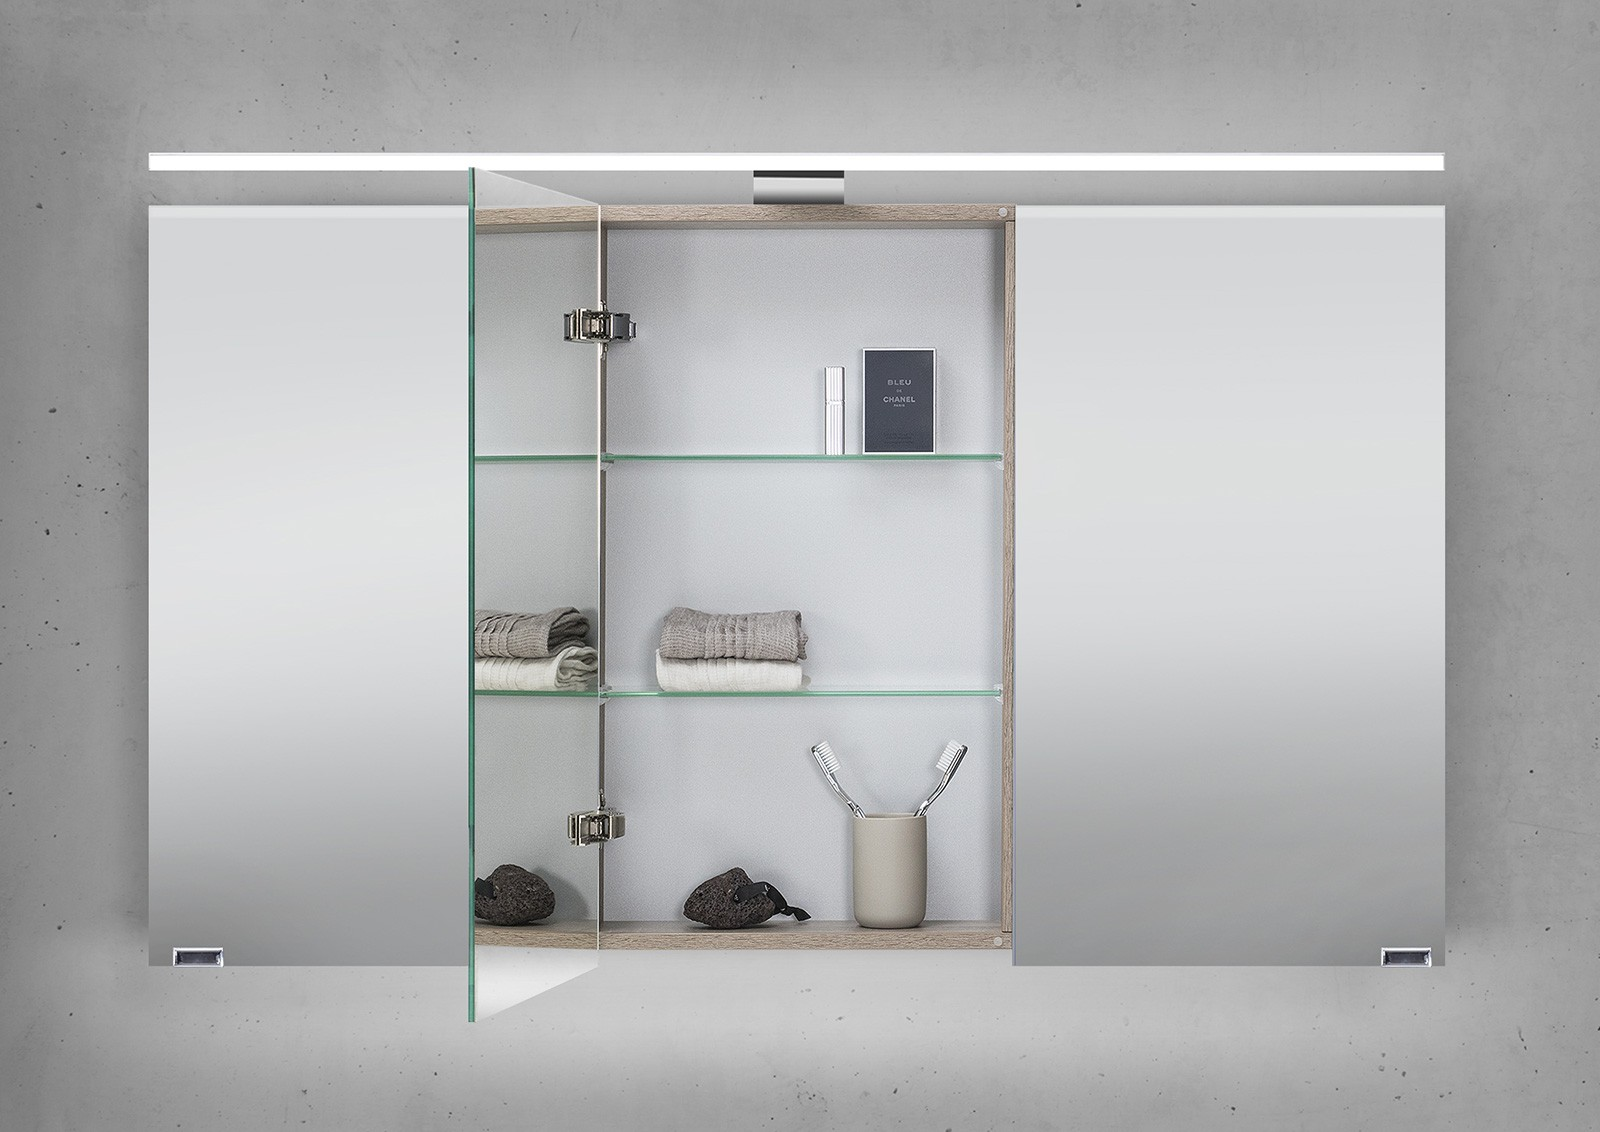 Spiegelschrank 120 cm led beleuchtung doppelt verspiegelt for Spiegelschrank 120